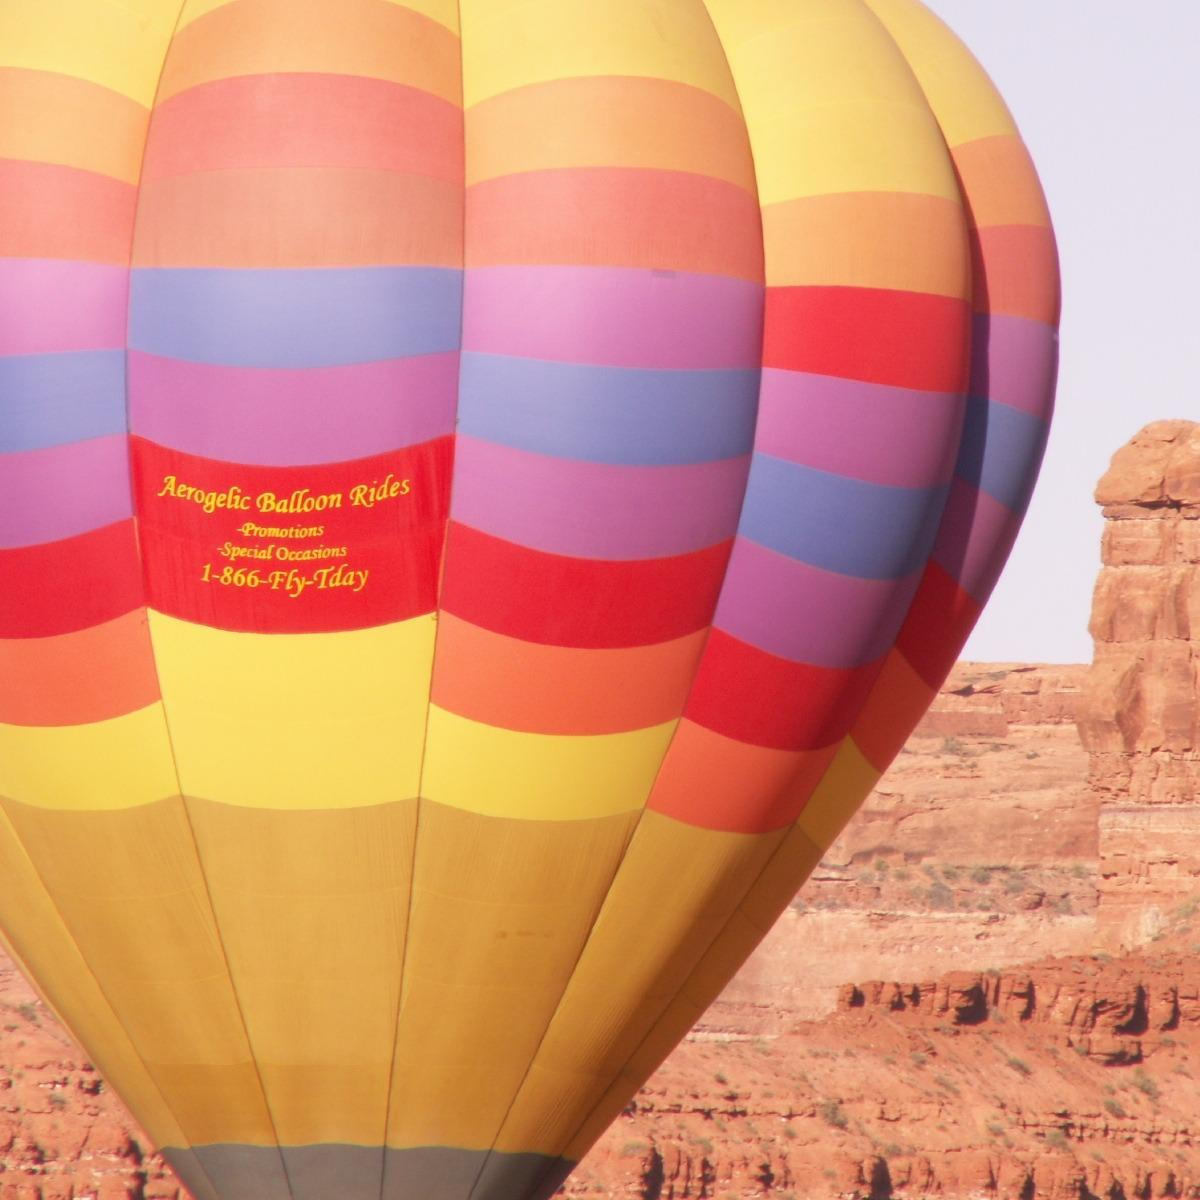 Phoenix Hot Air Balloon Rides Aerogelic Ballooning